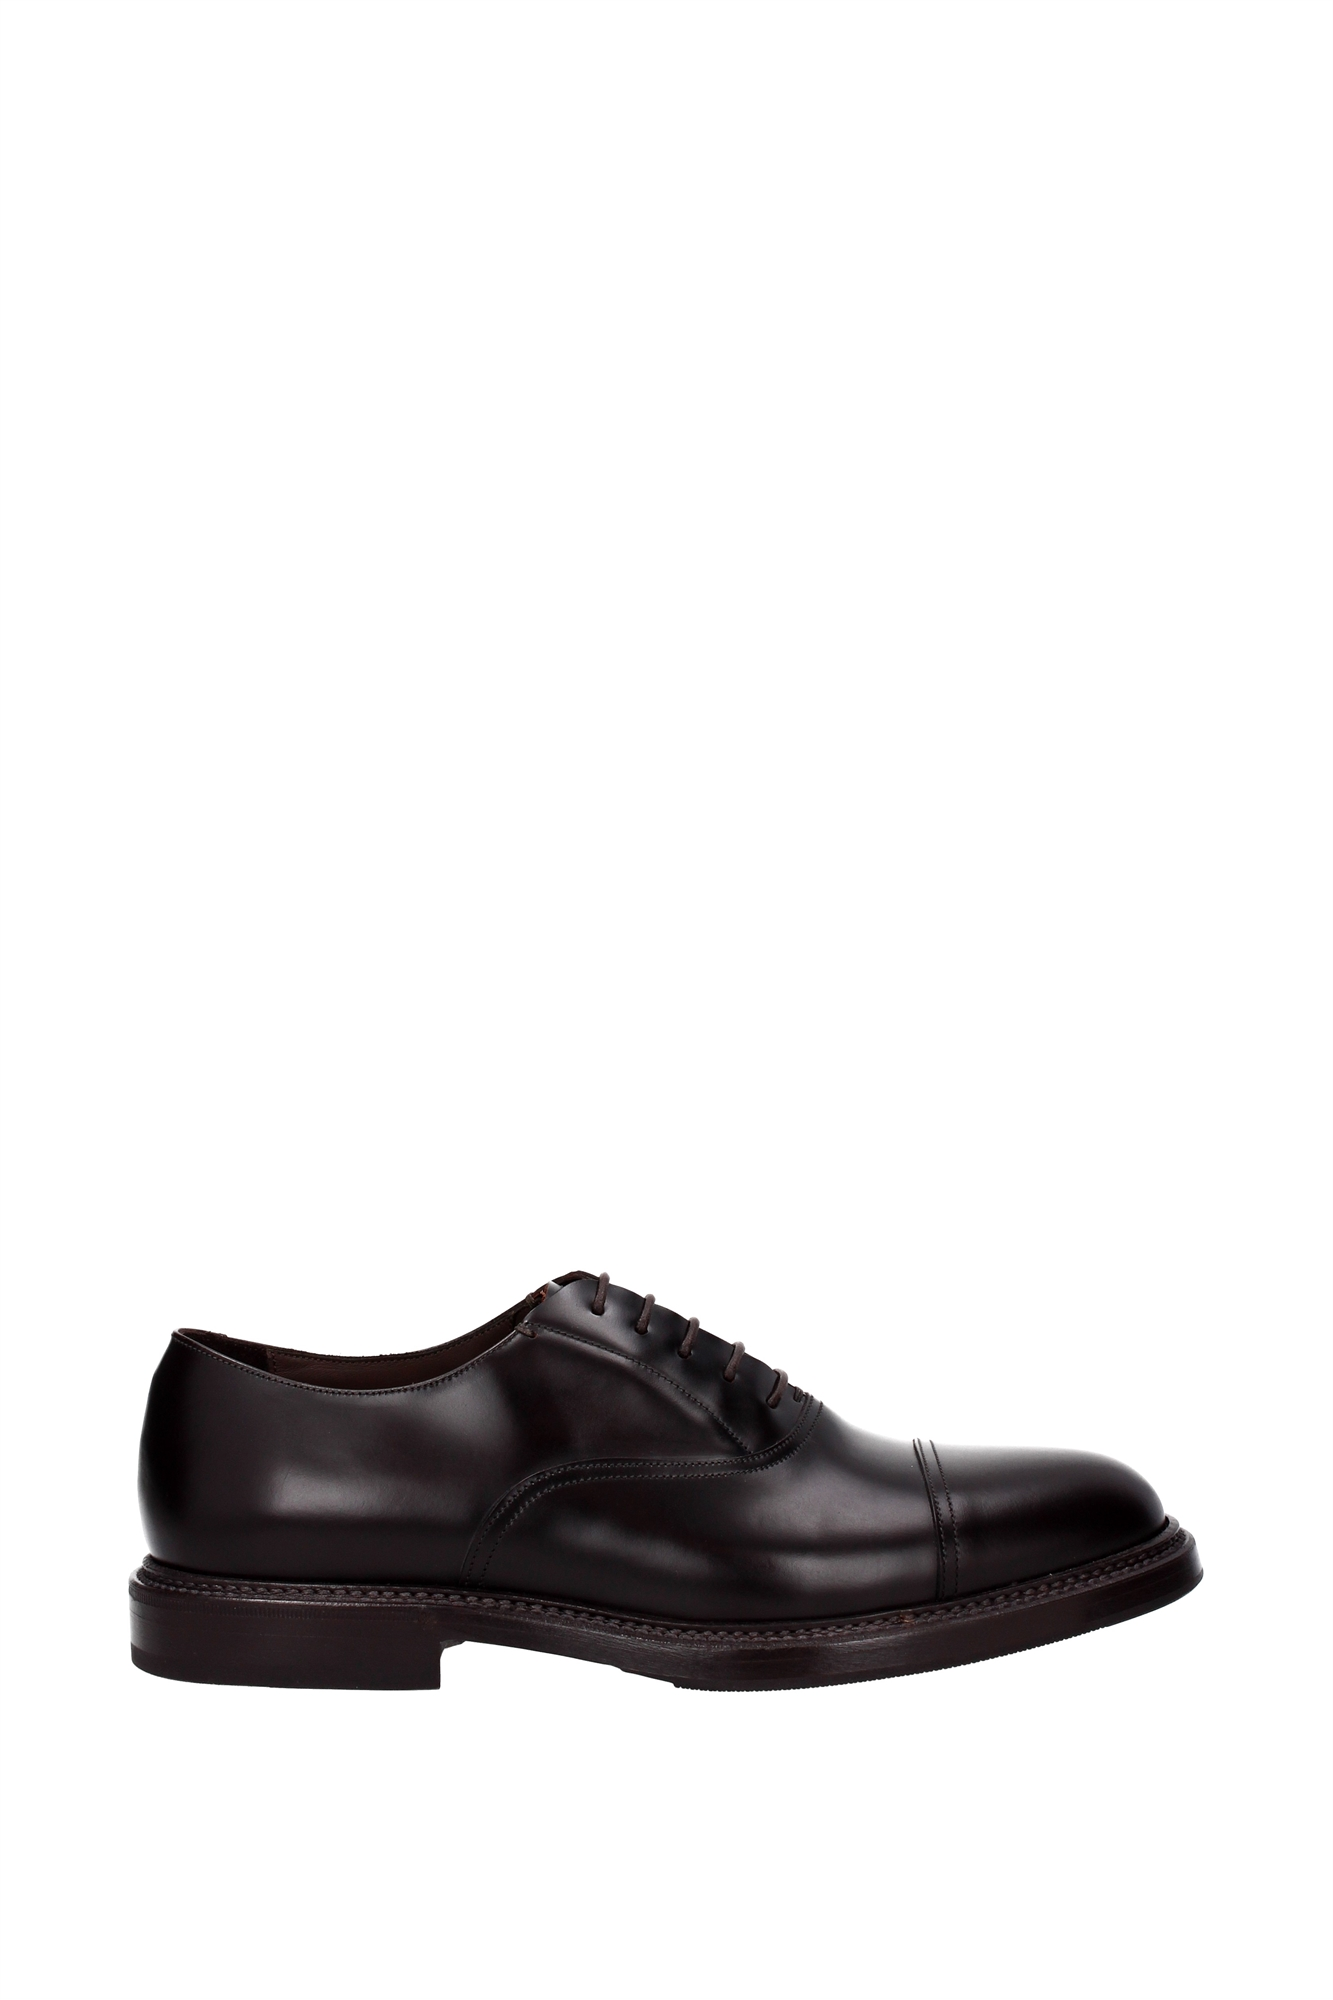 Scarpe casual da uomo  Laced shoes Green George uomo -  (6056ROIS218)